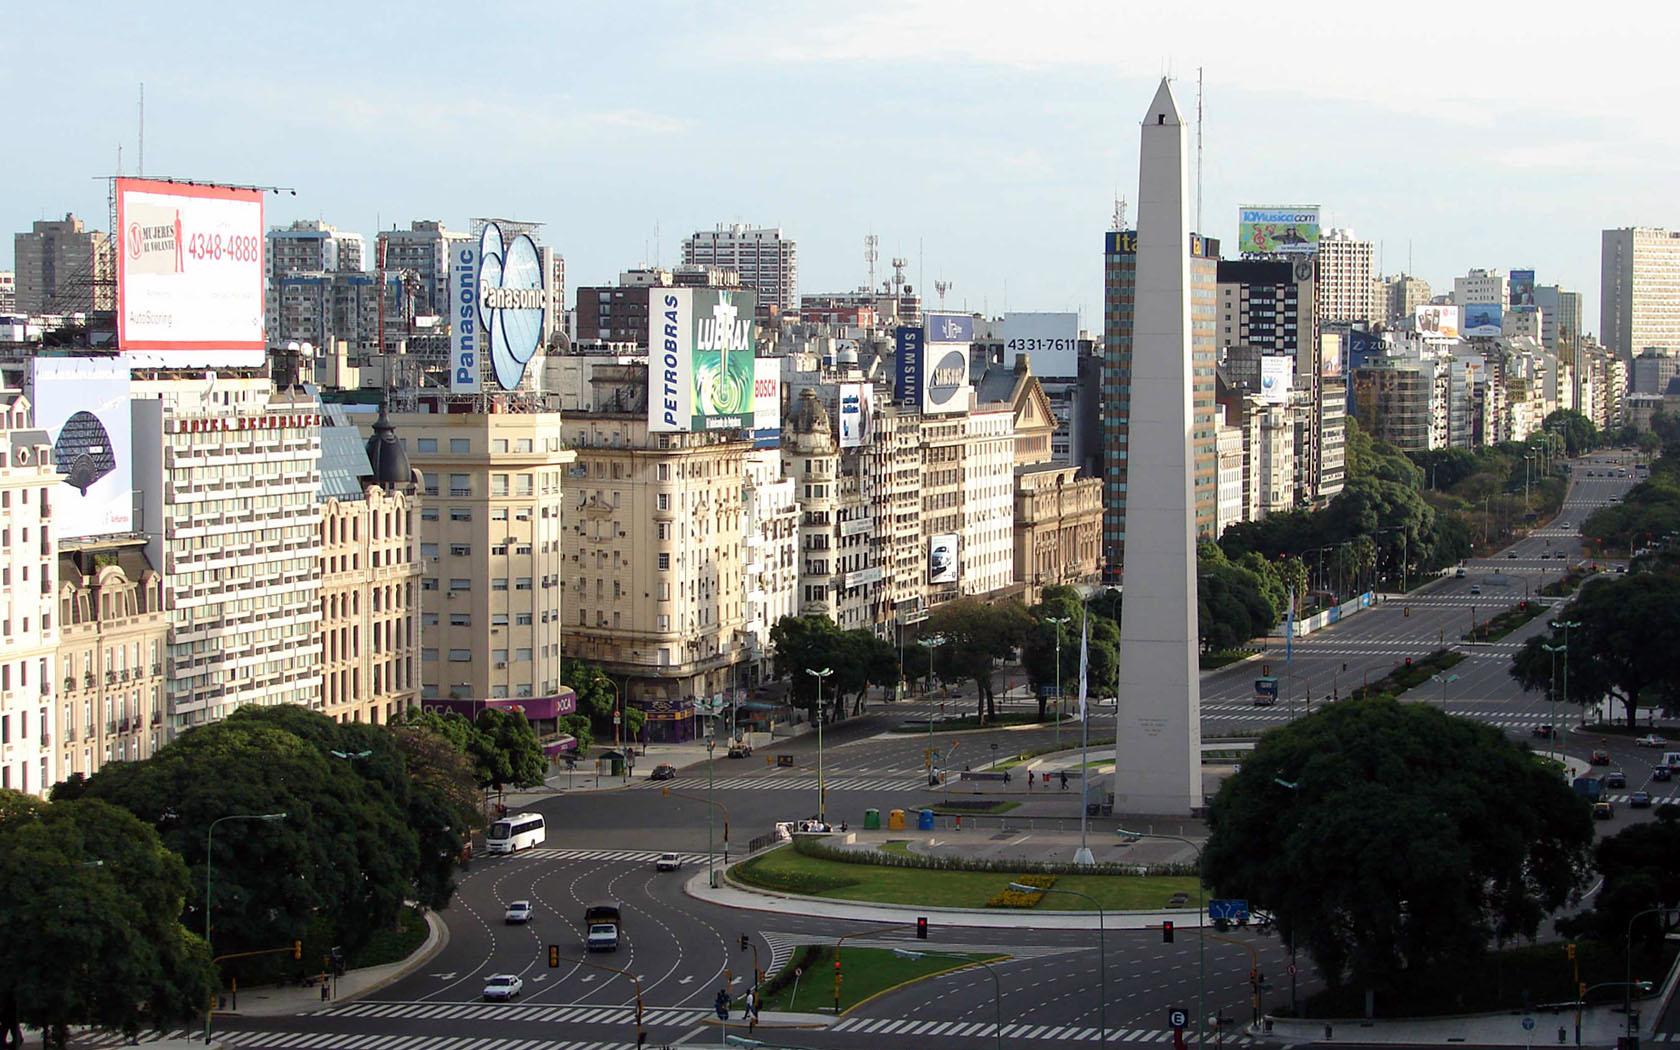 Buenos Aires Palermo Obelisk wallpaper